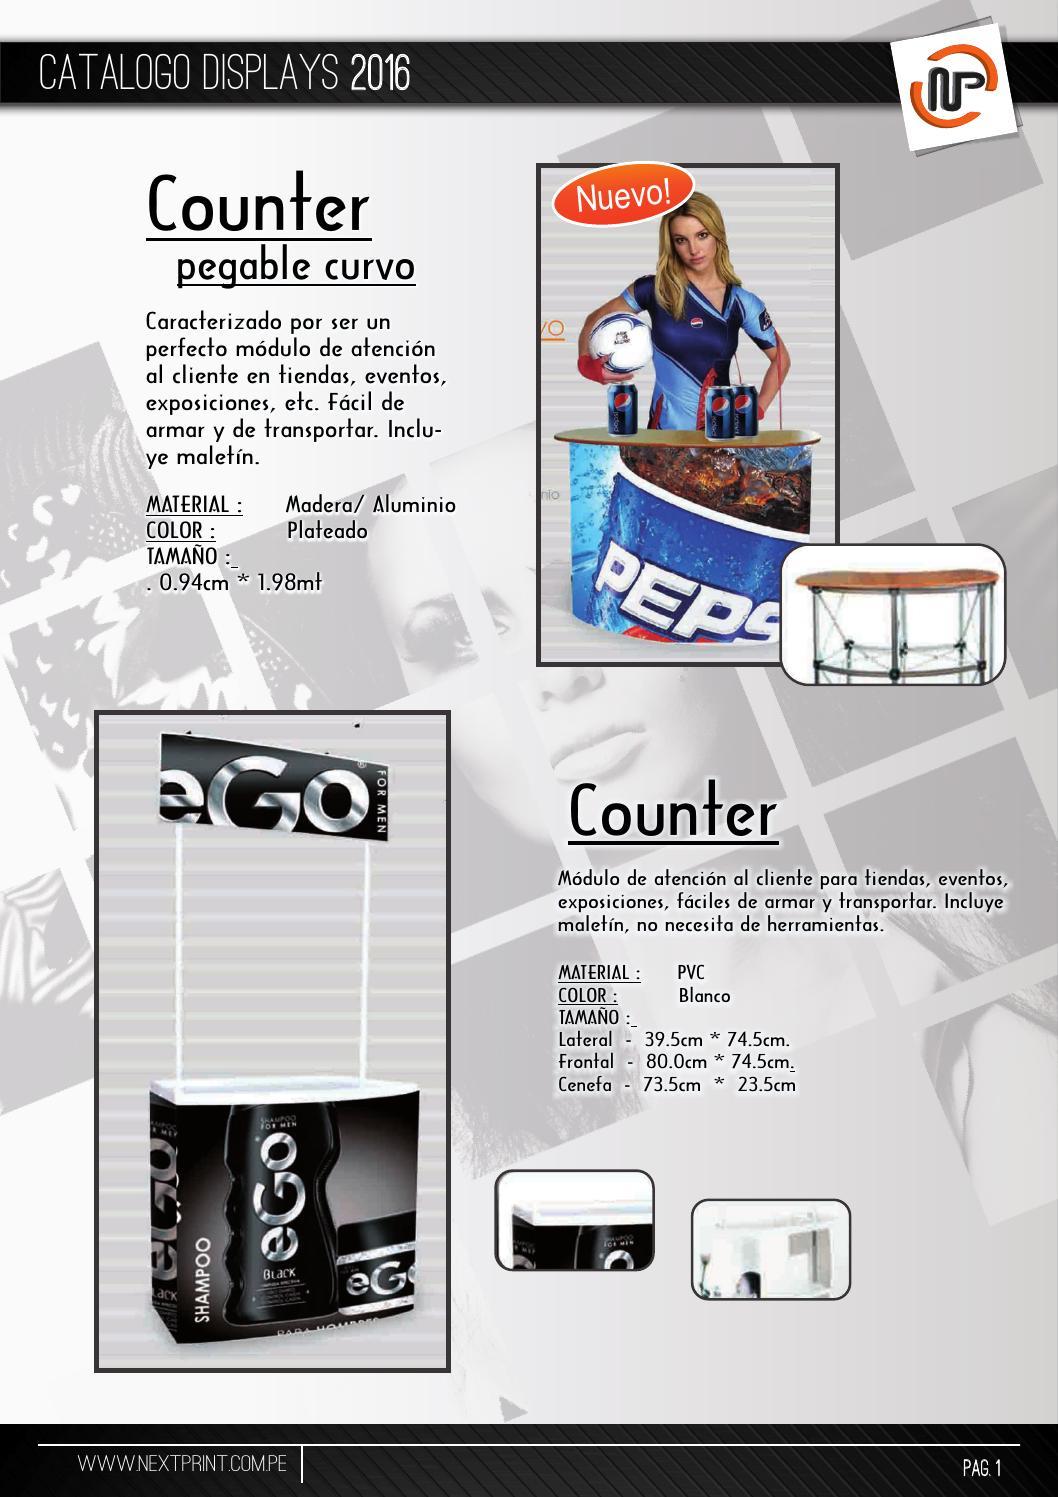 Catalogo Displays Np 2016 By Next Print Sac Issuu